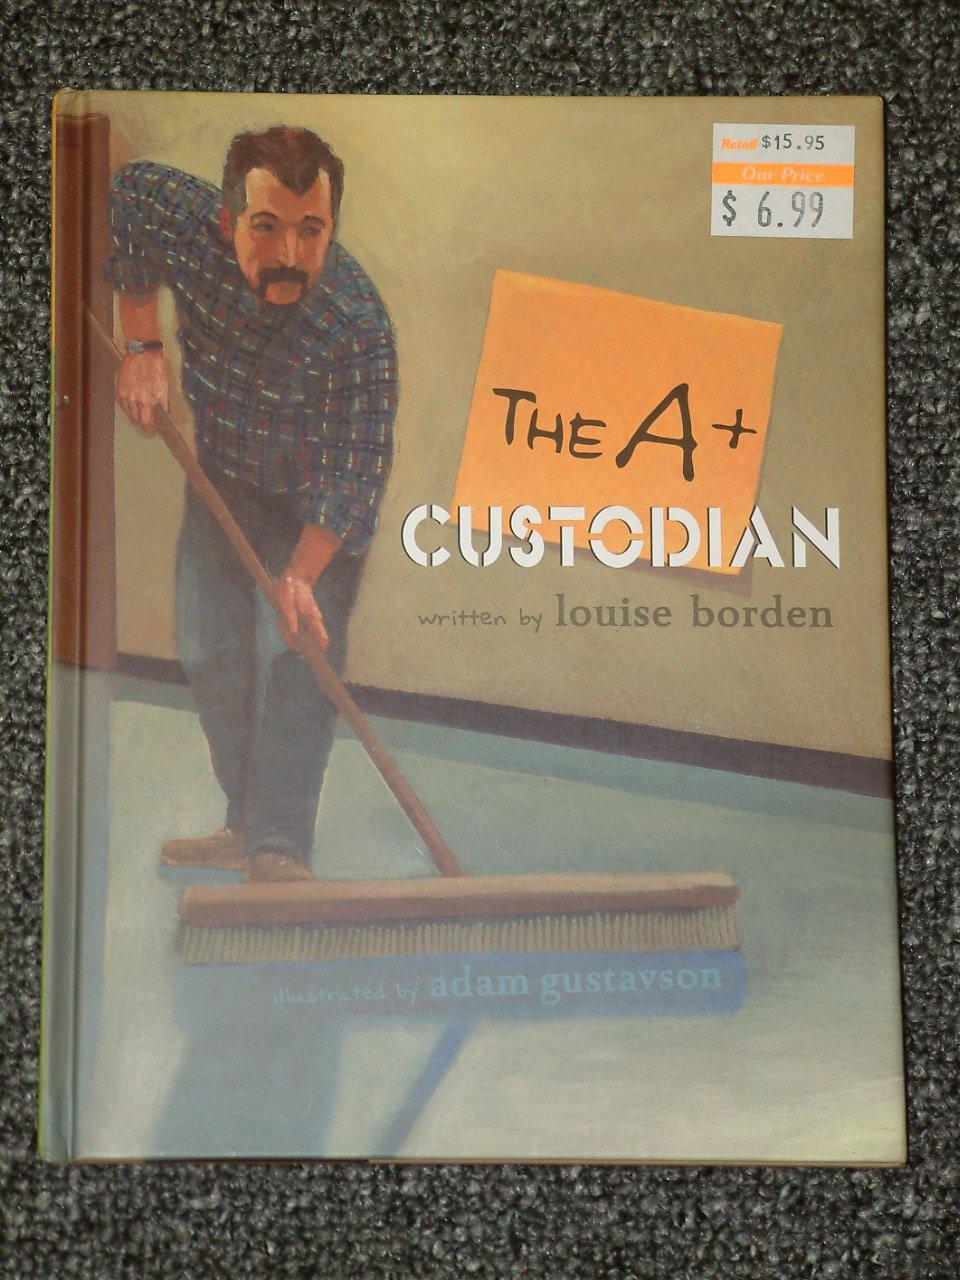 The A+ Custodian by Louise Borden 2004